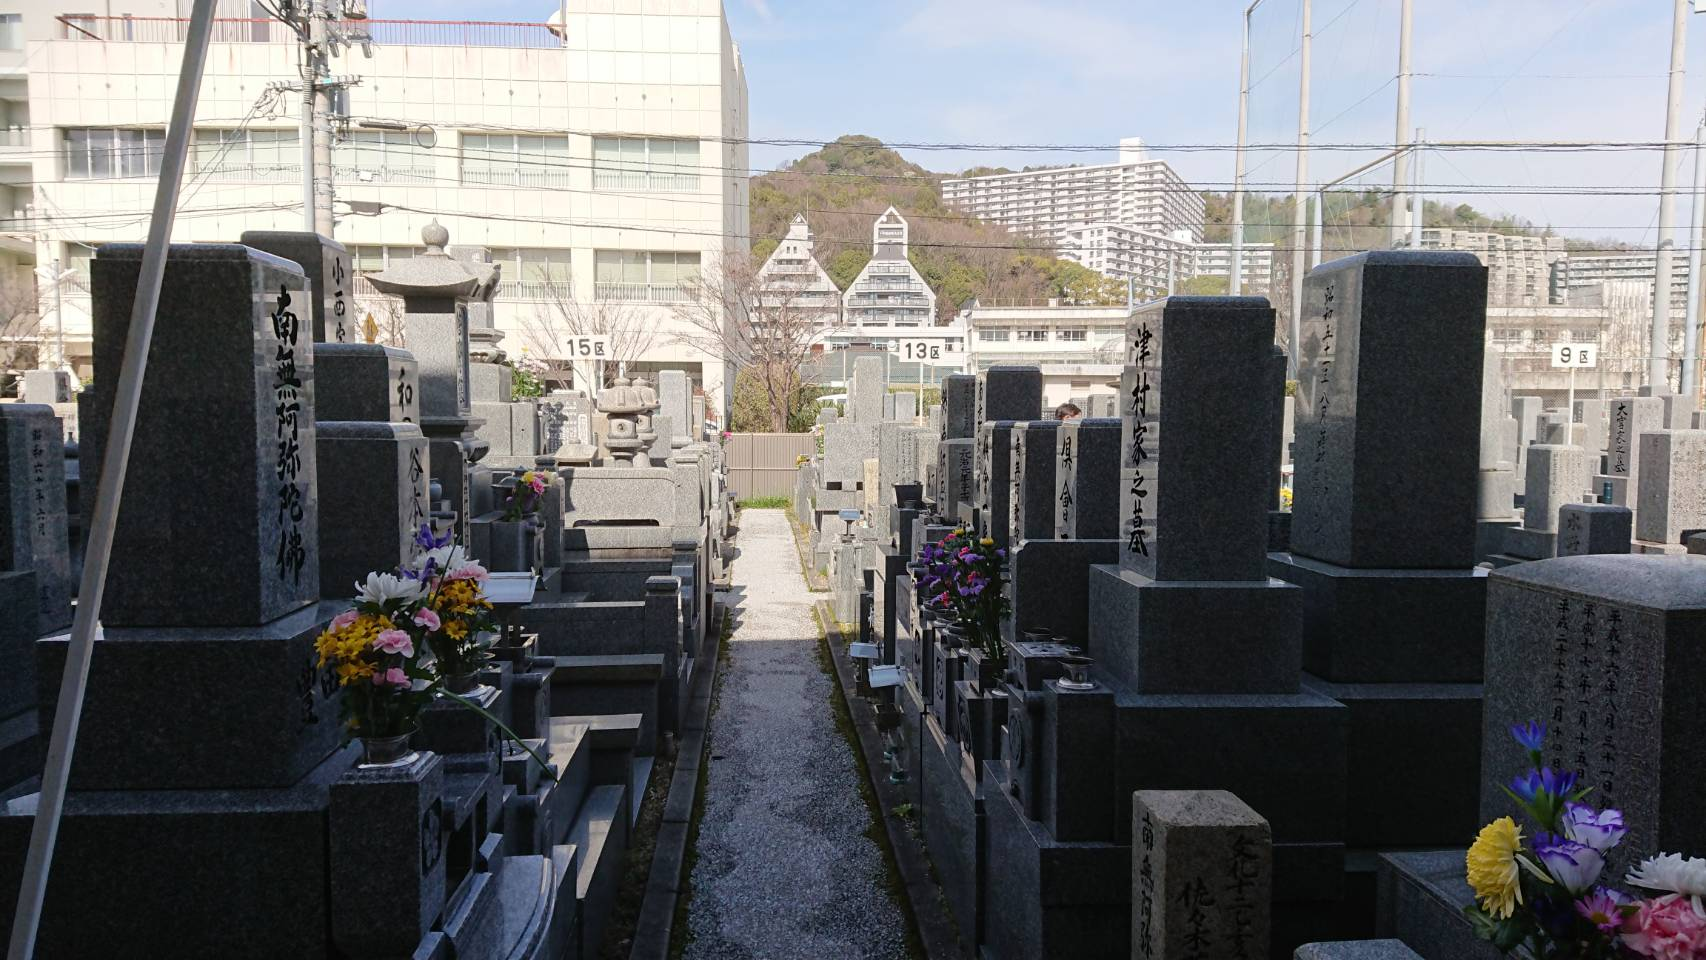 専光寺墓苑の園内風景⑦